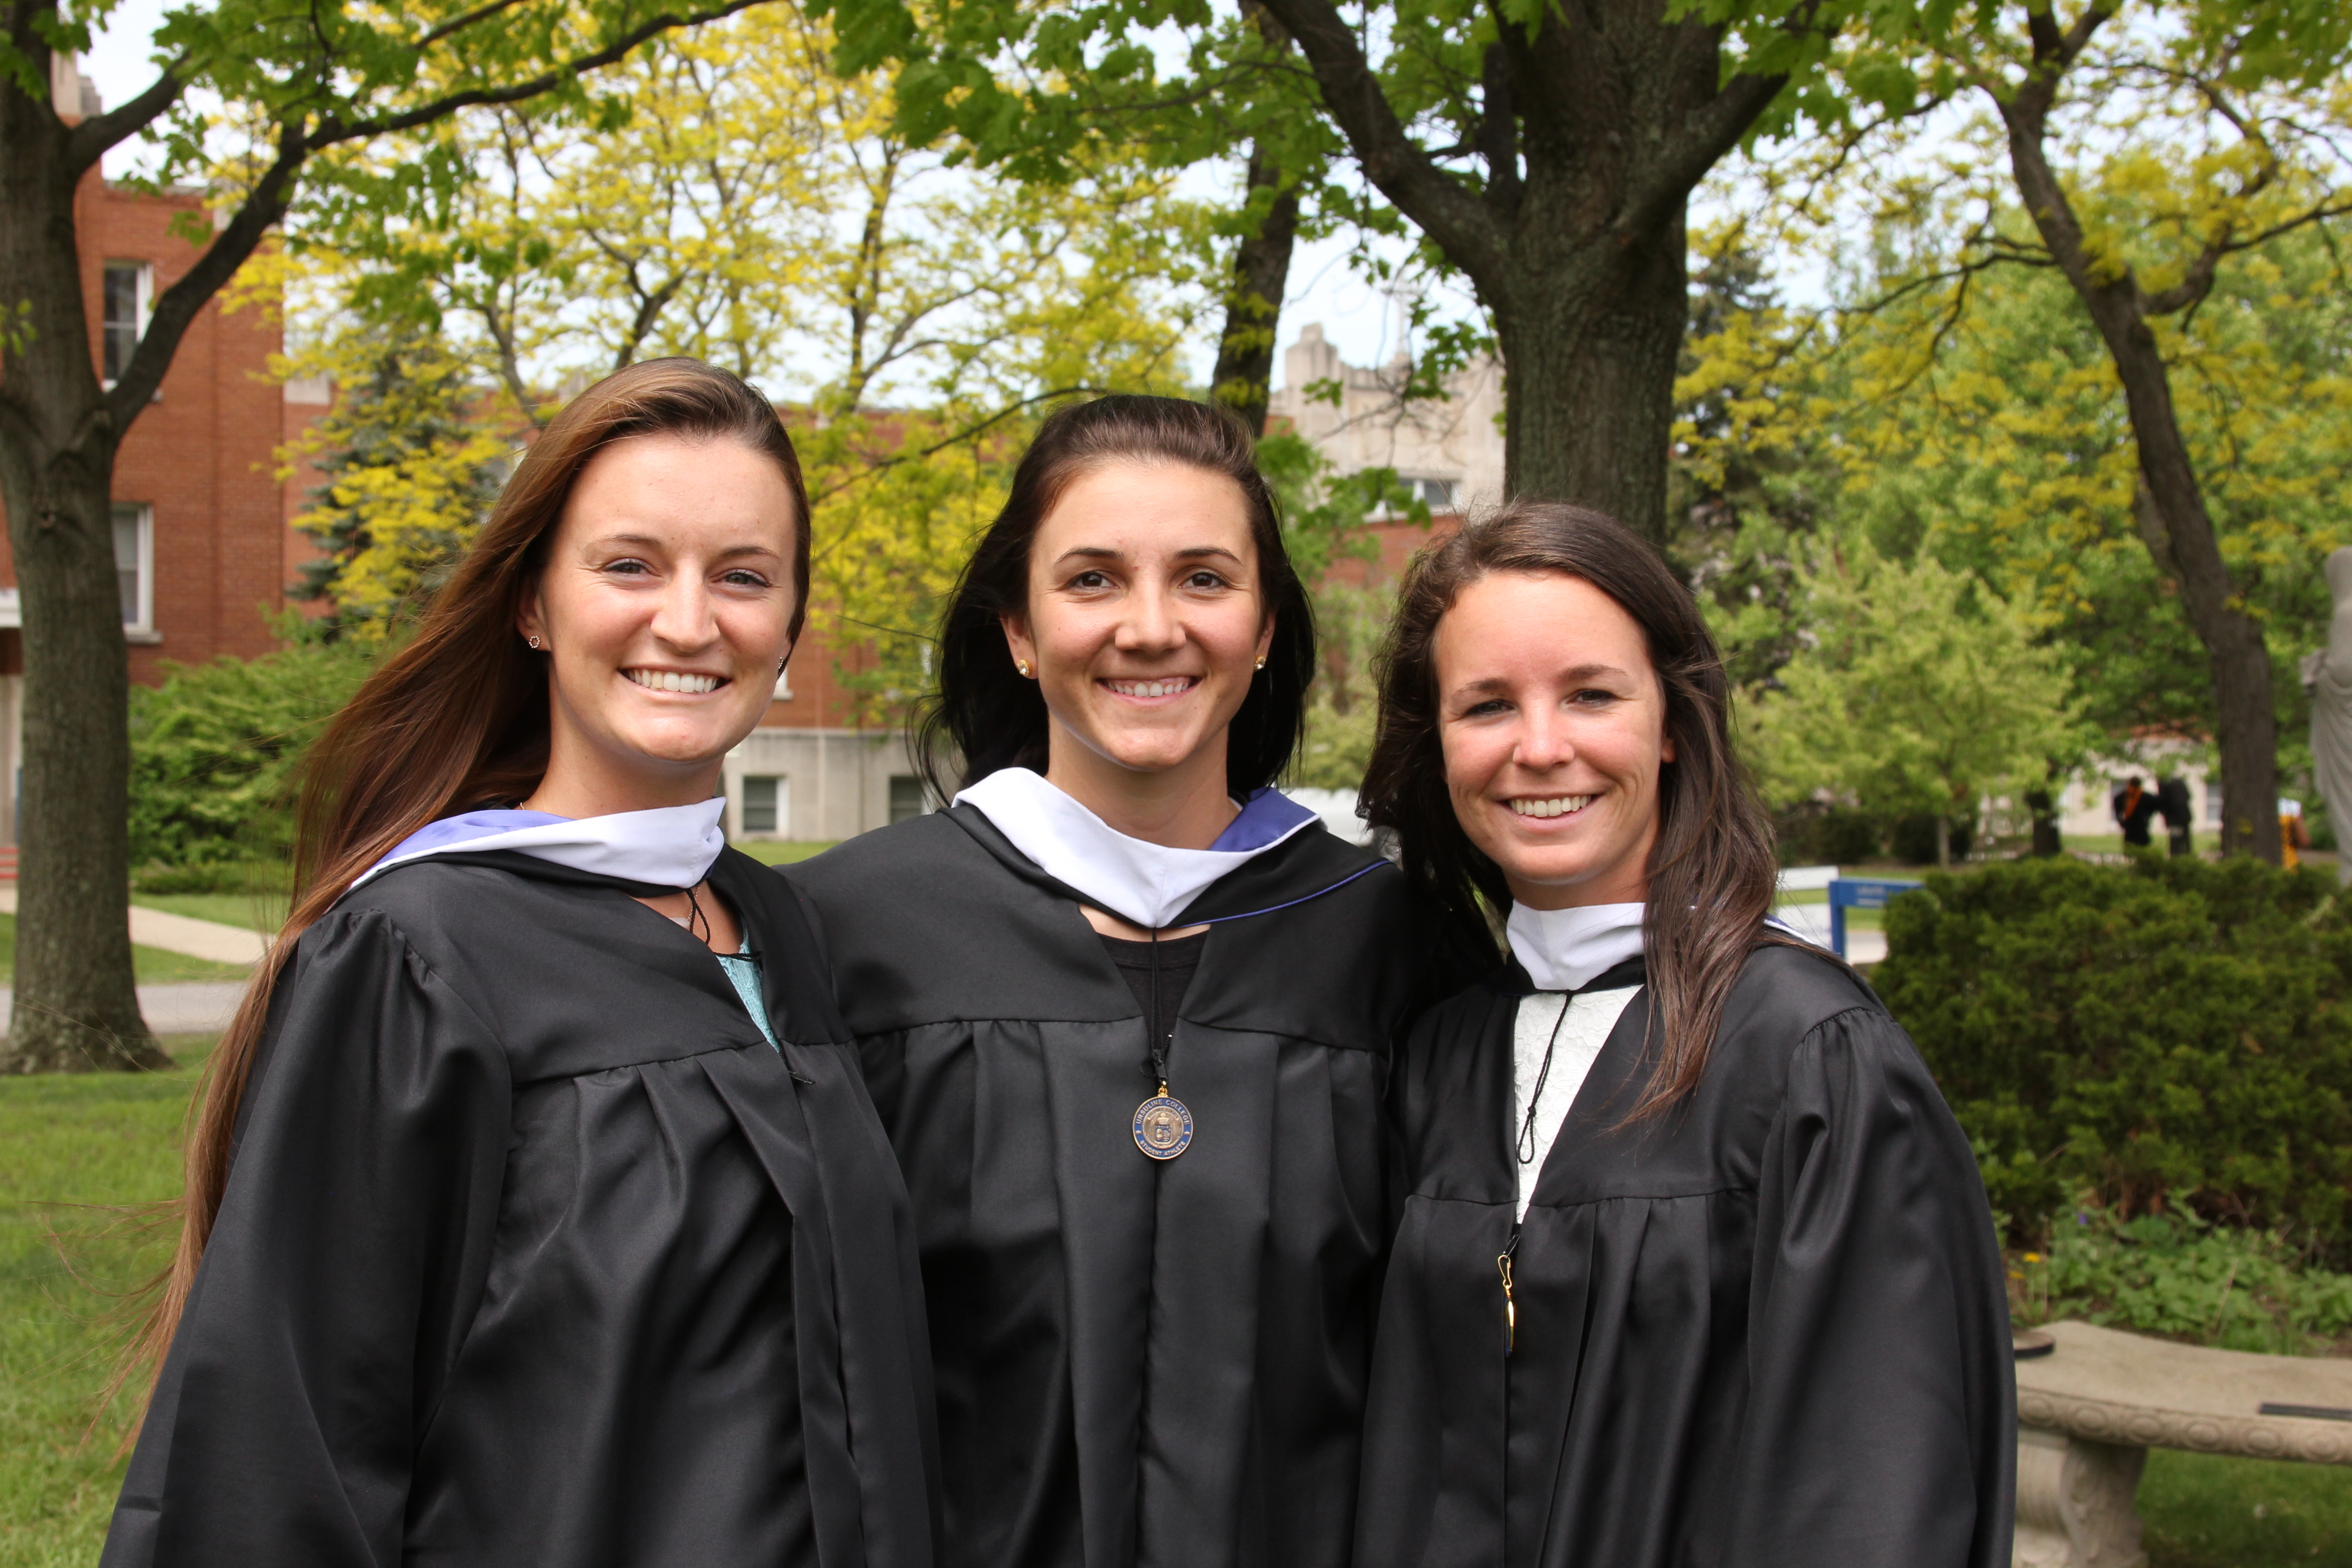 2018 Graduates at Baccalaureate Mass